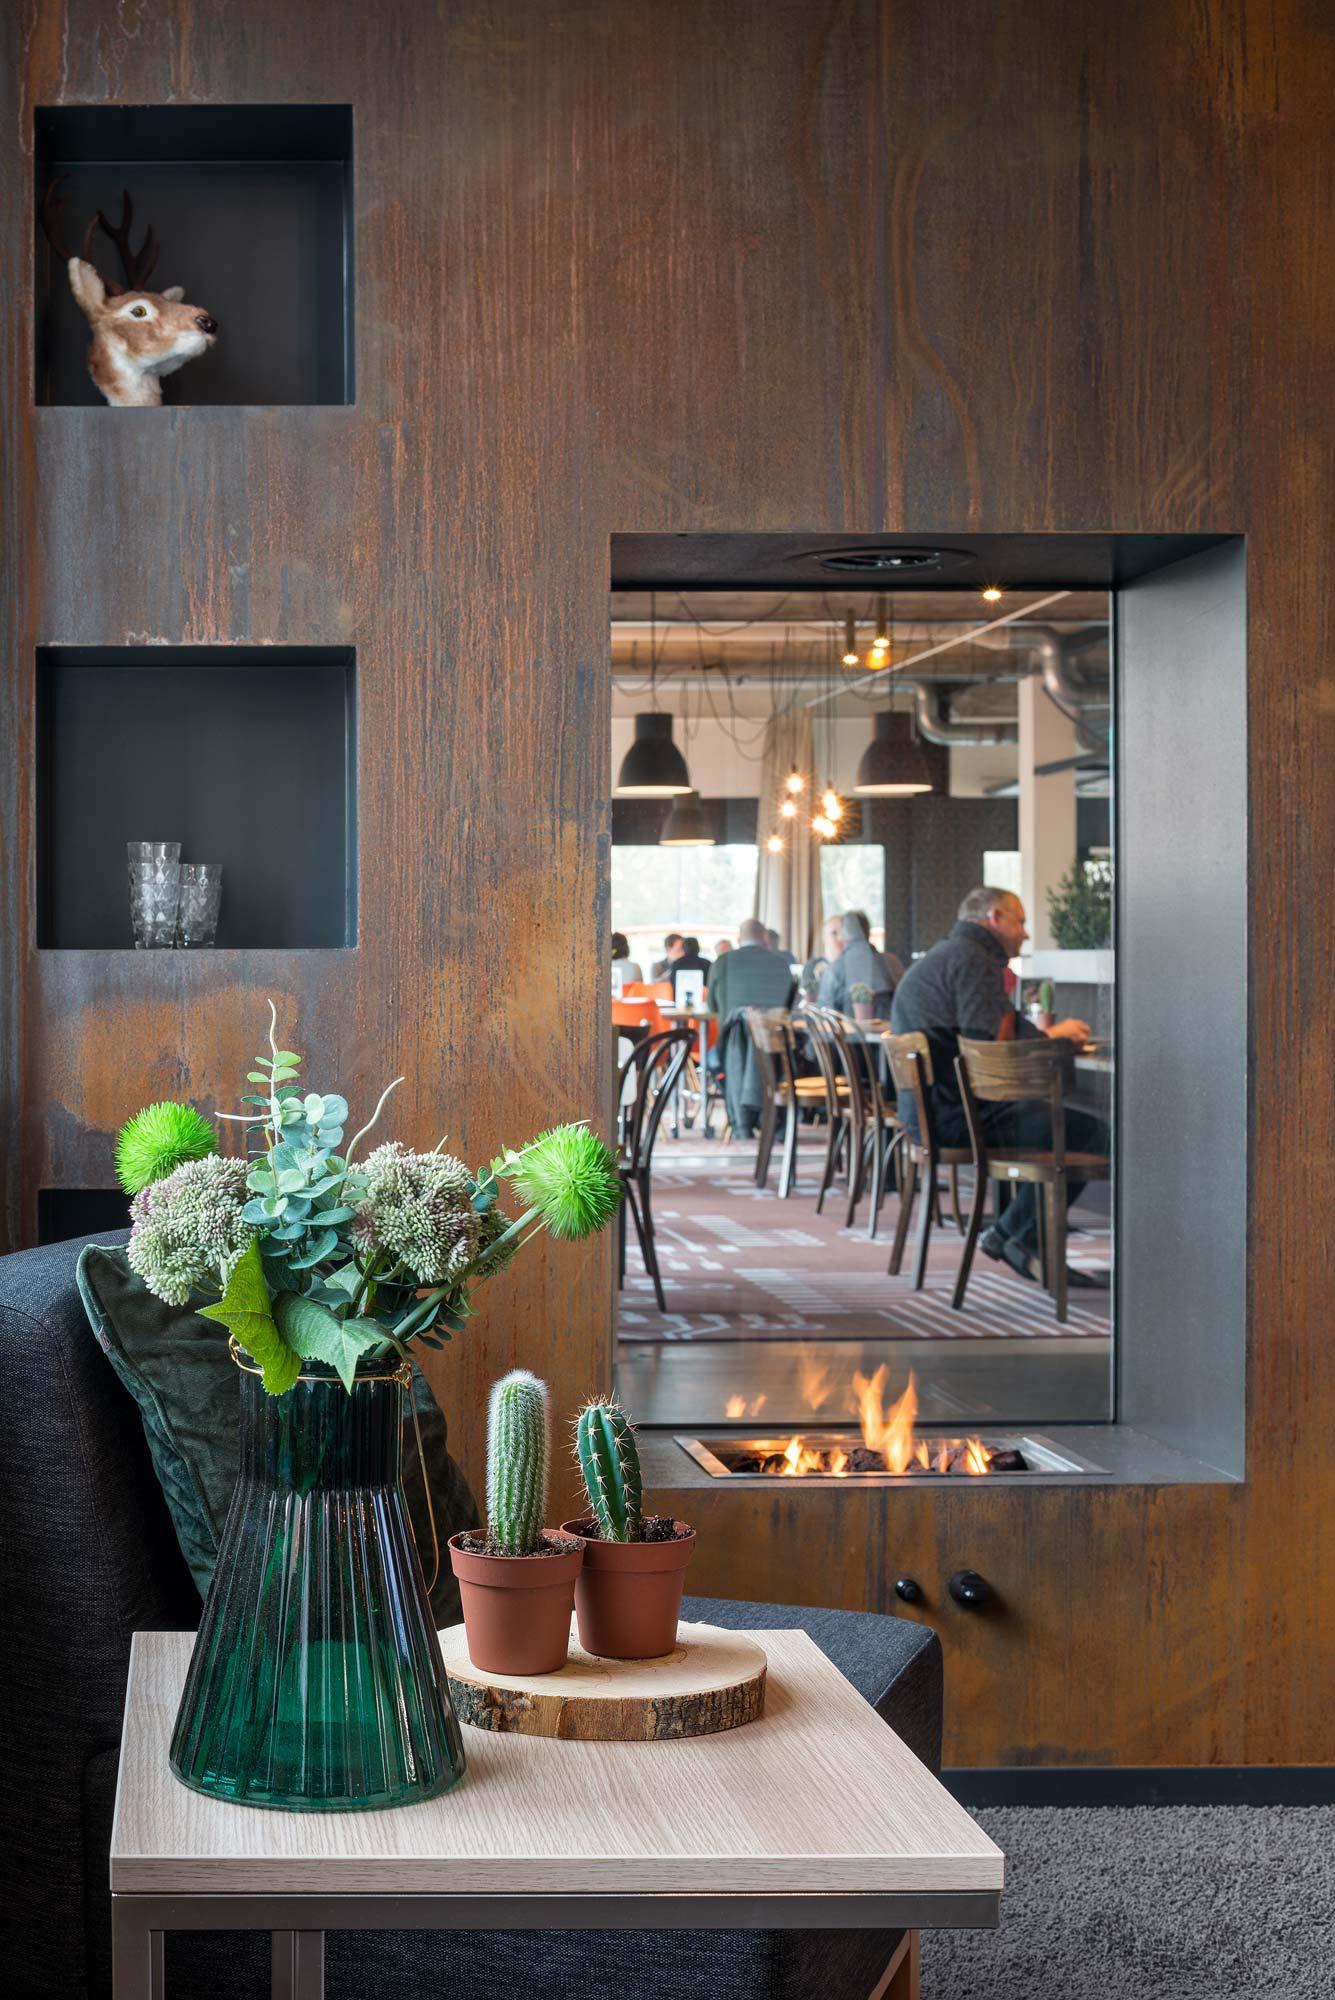 Fizzionparc Oak Building kantoorruimte - fotografie Chiel de Nooyer, interieurfotograaf